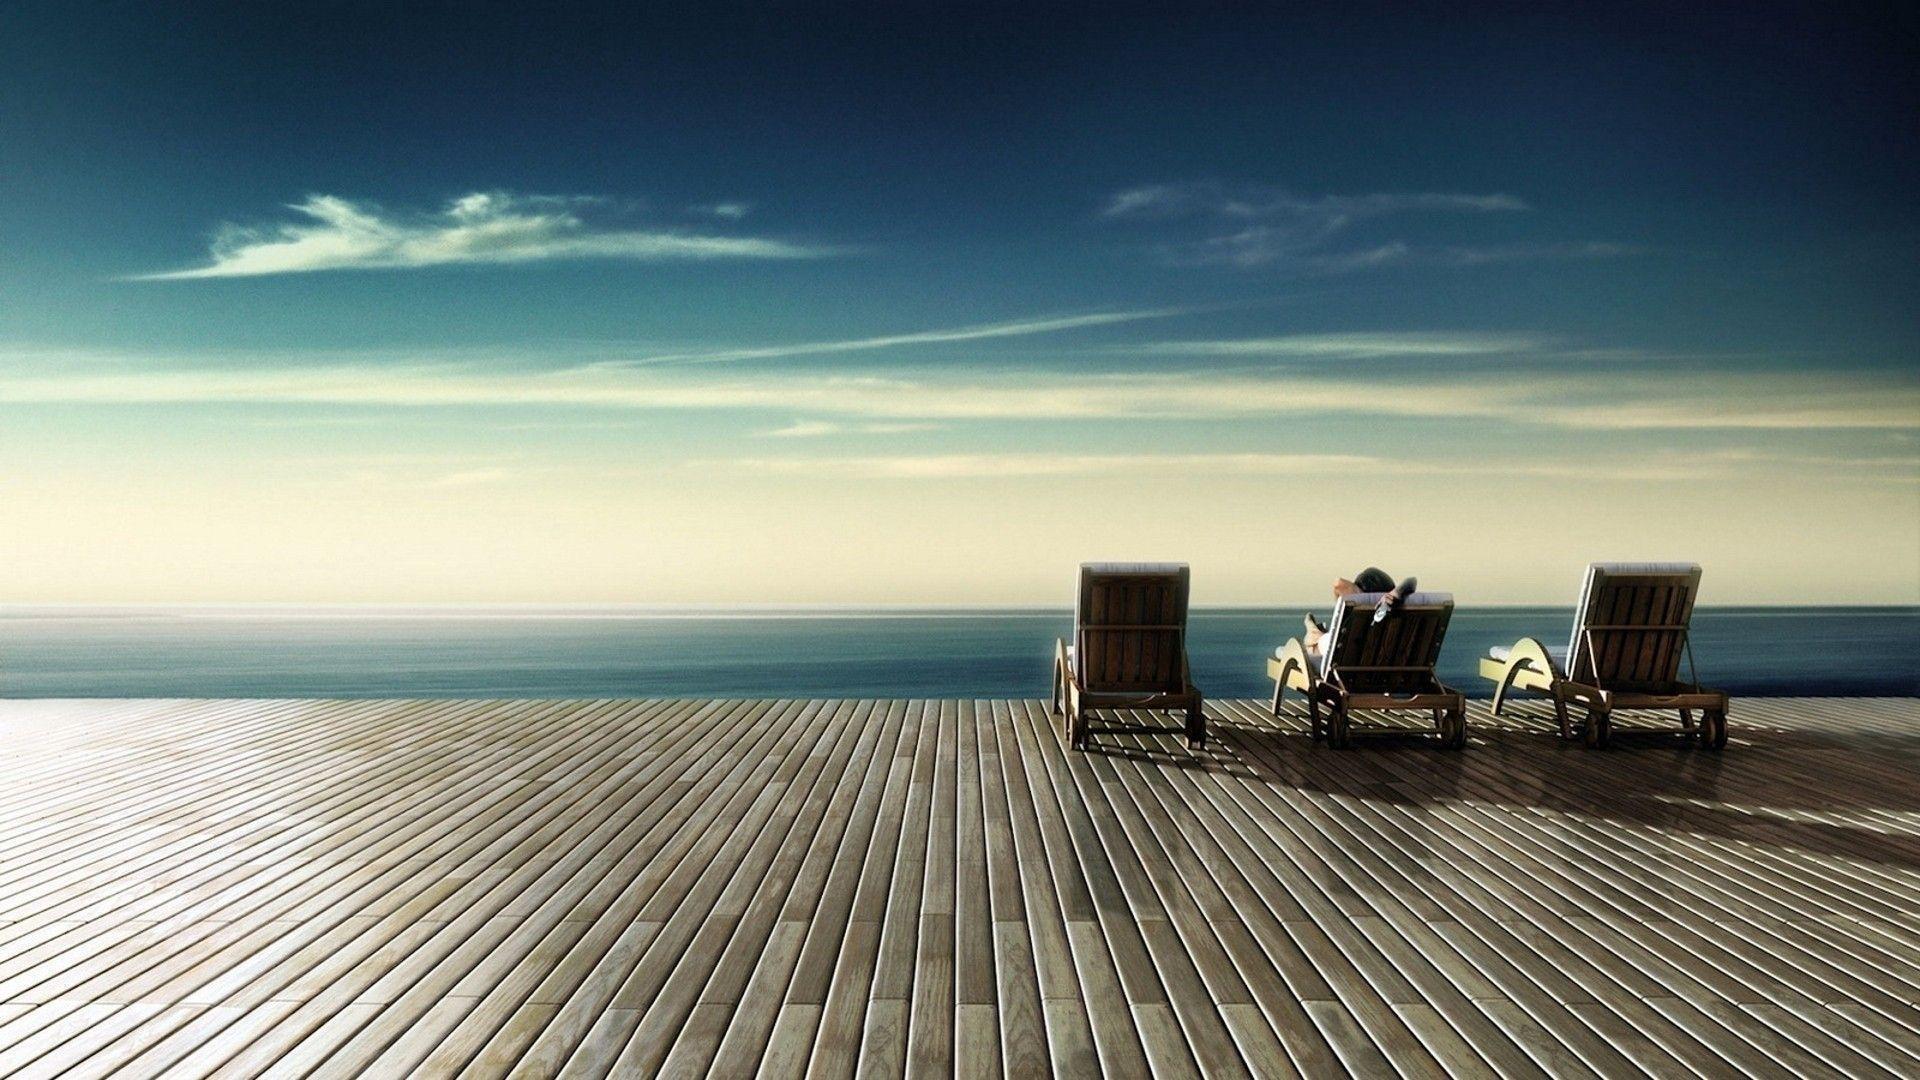 Wallpapers For > Relaxing Backgrounds Desktop